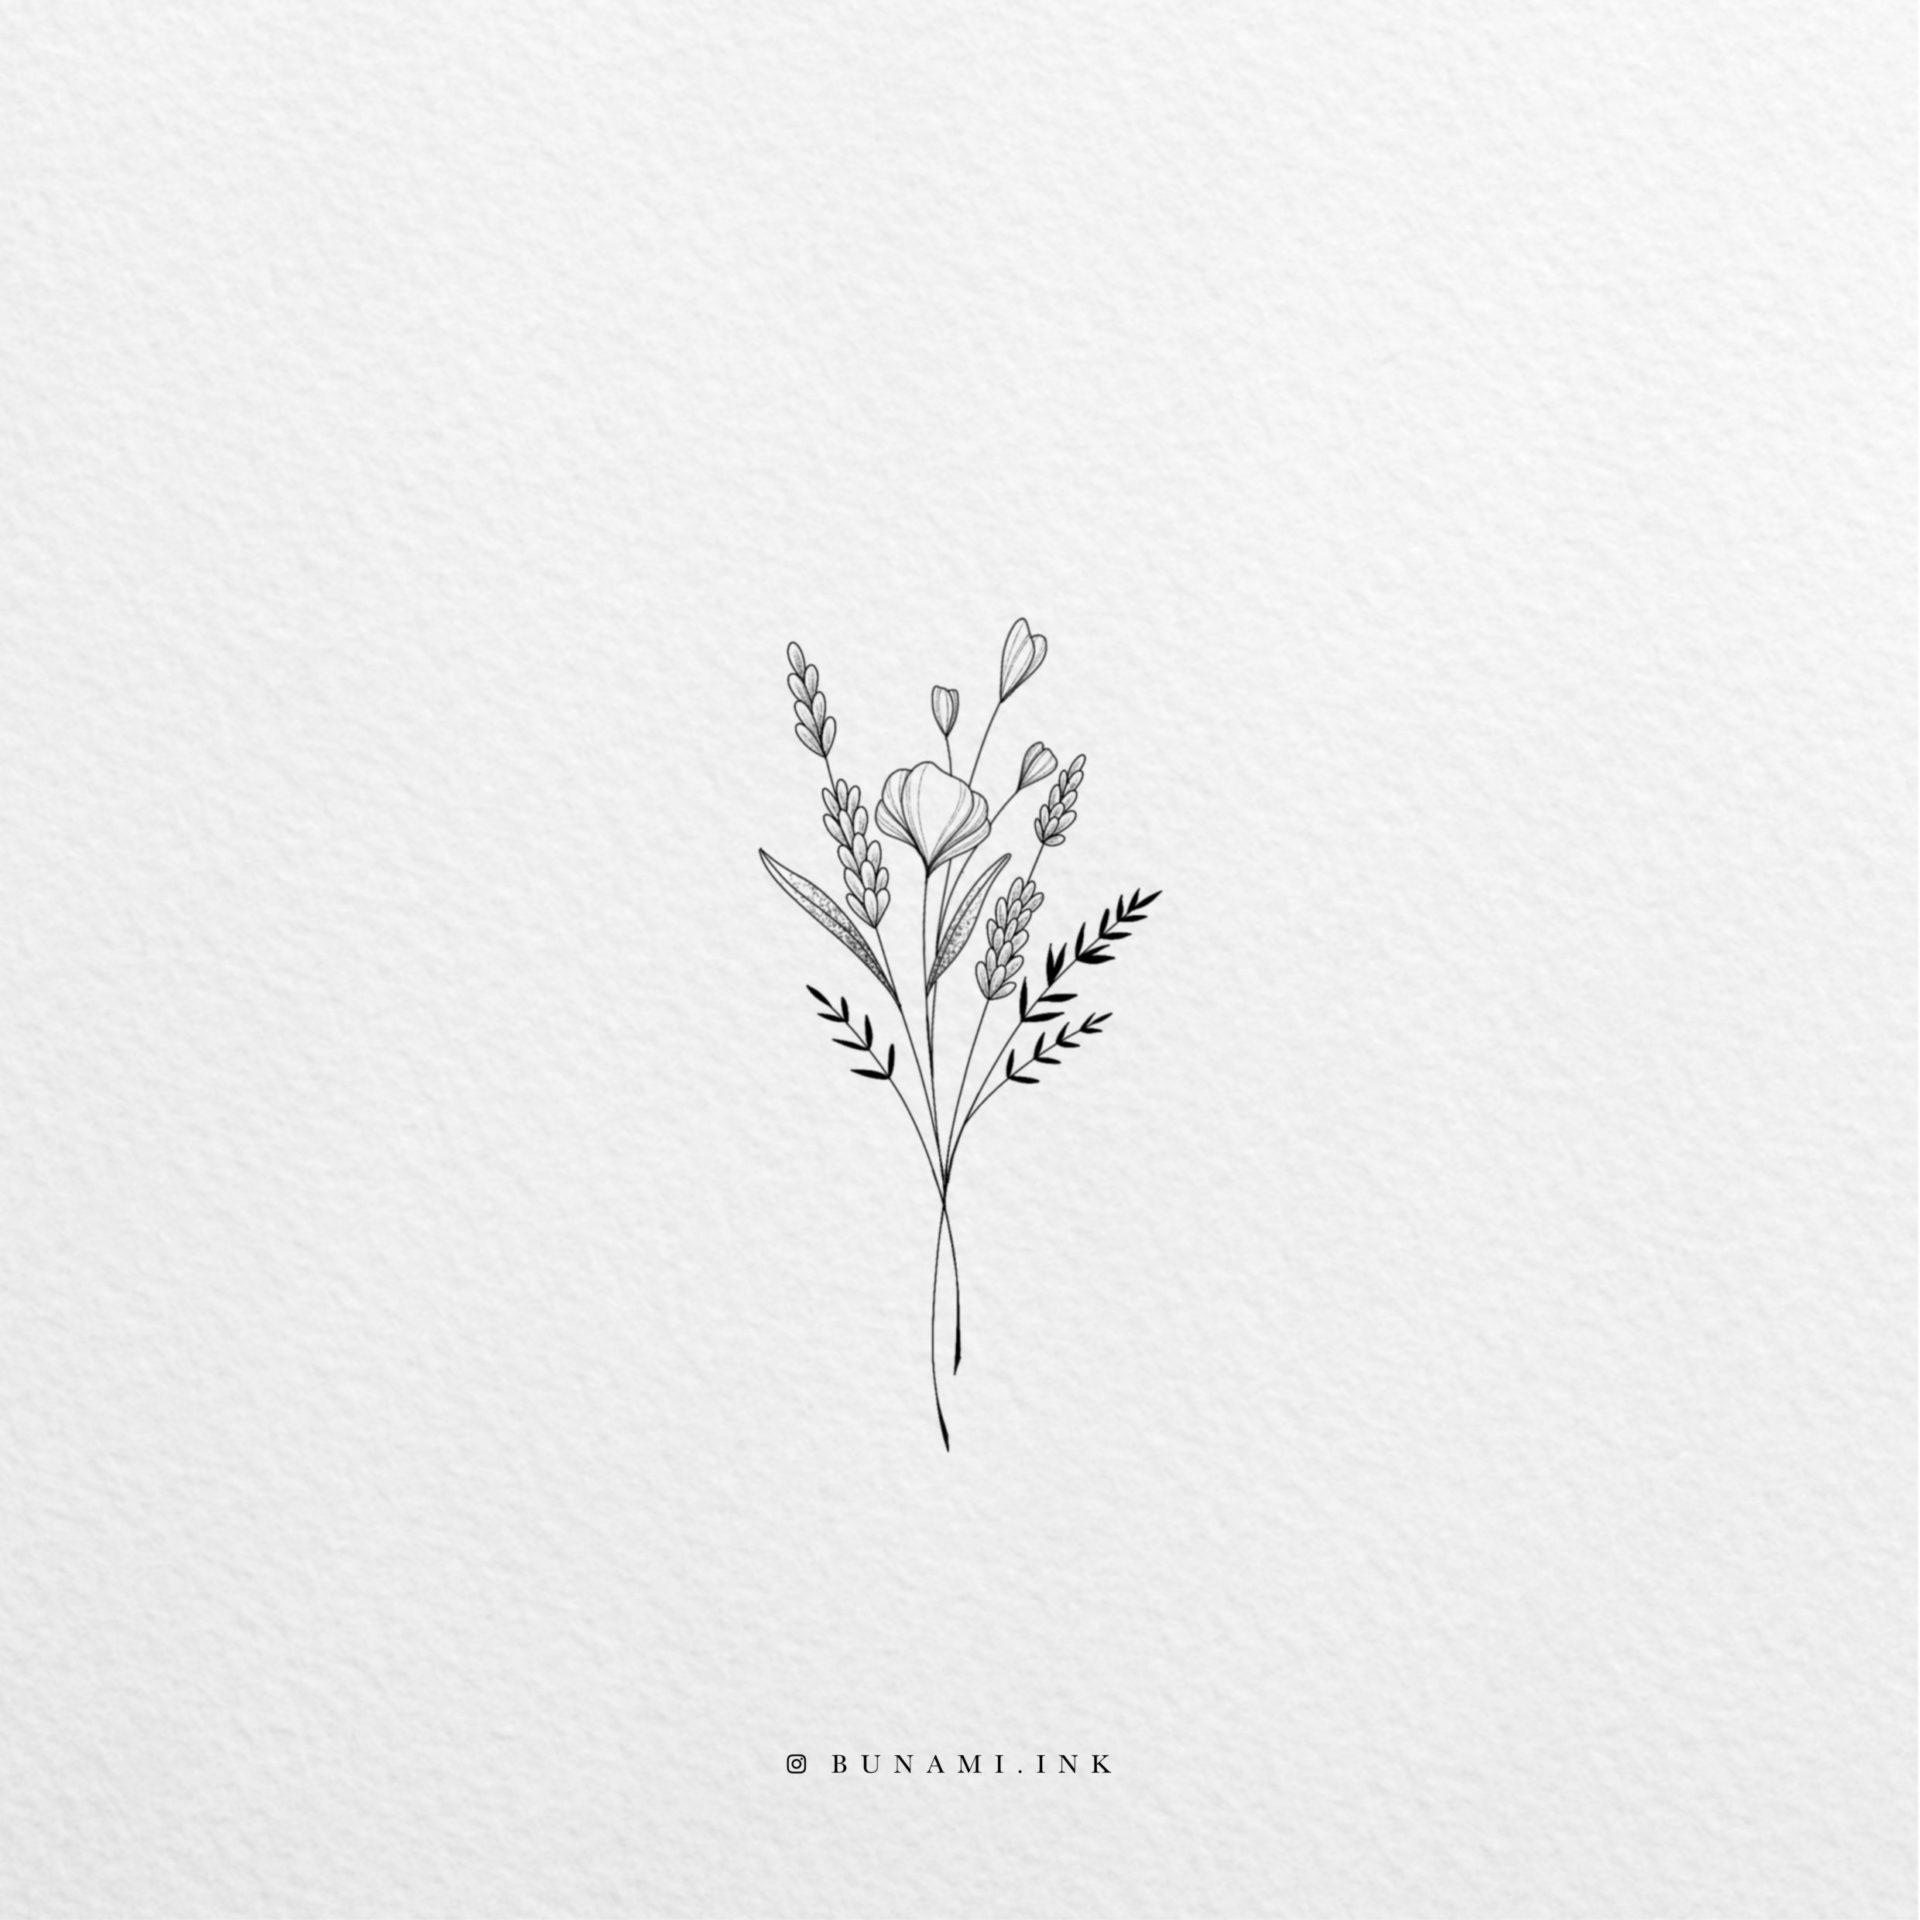 wild_lavender_bouquet_2019-12-22